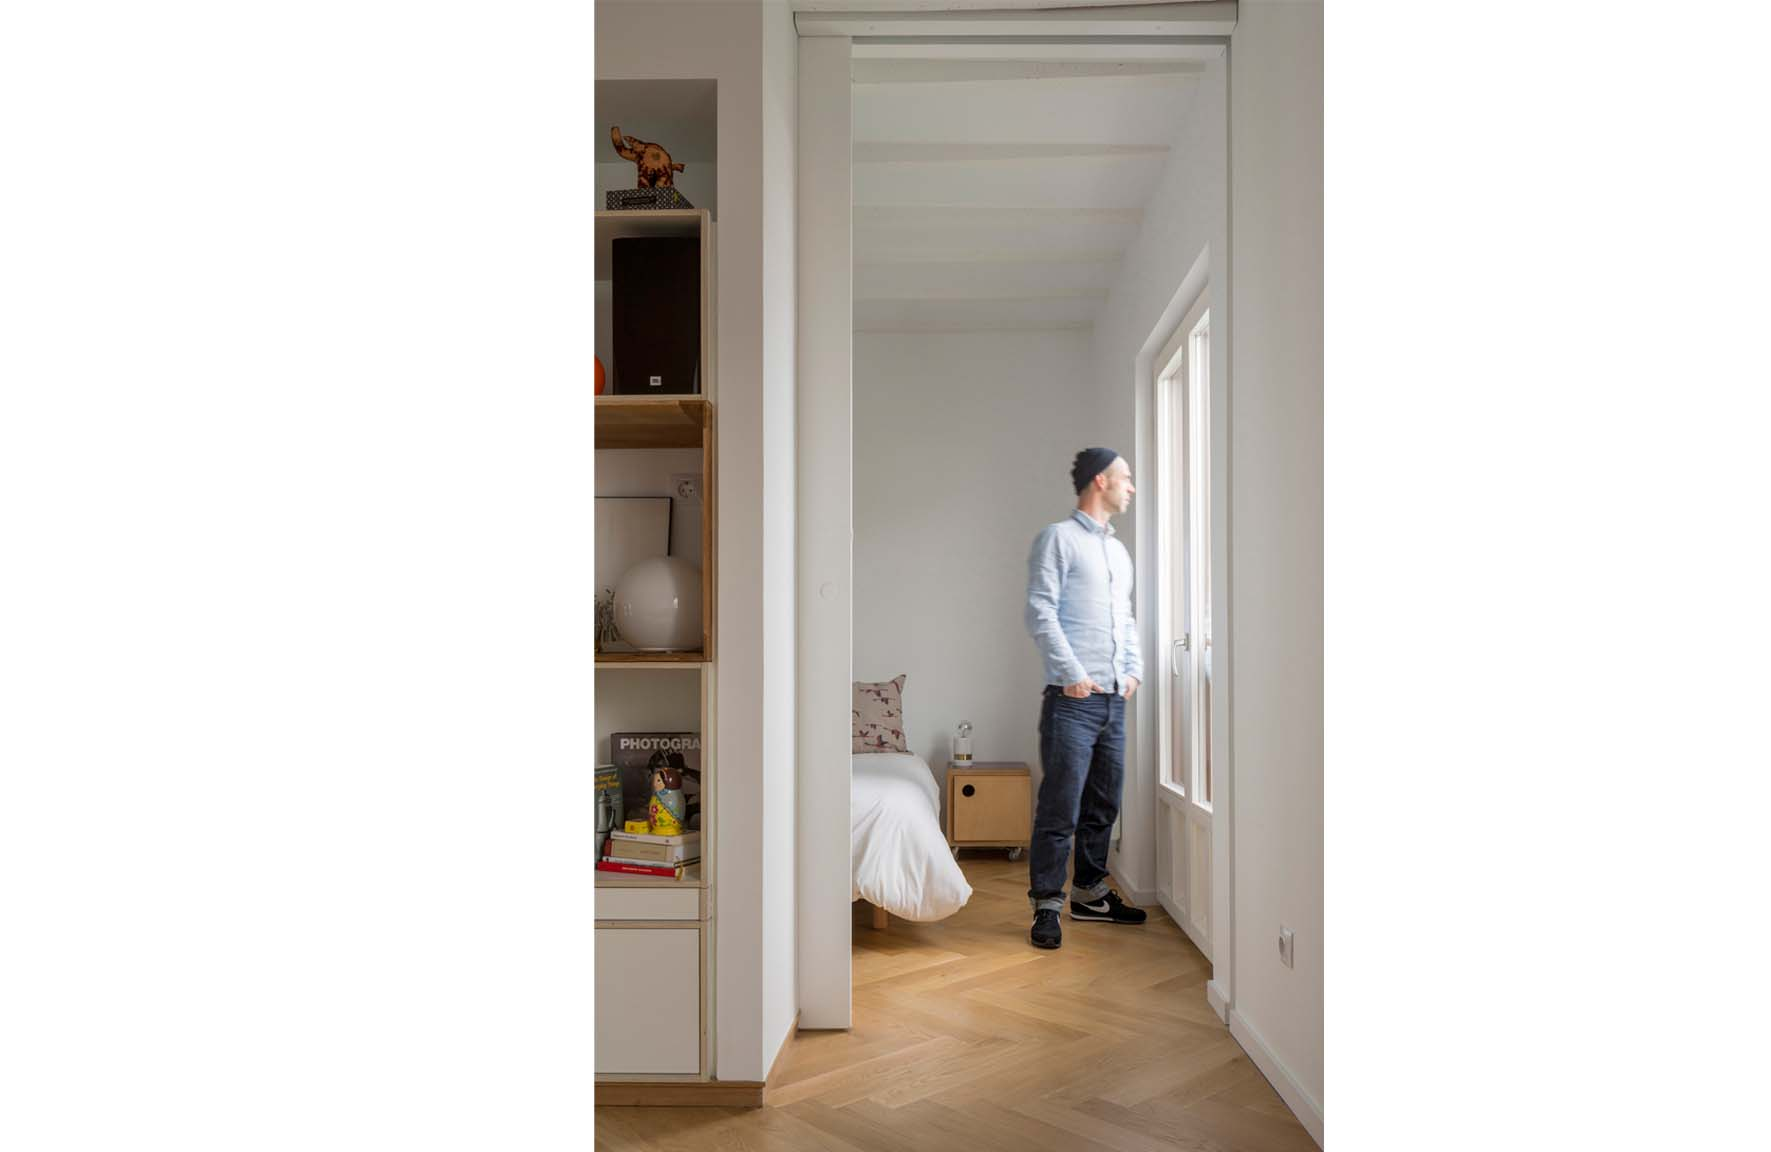 Apartment La Vieja-Bilbao-Image 01.jpg